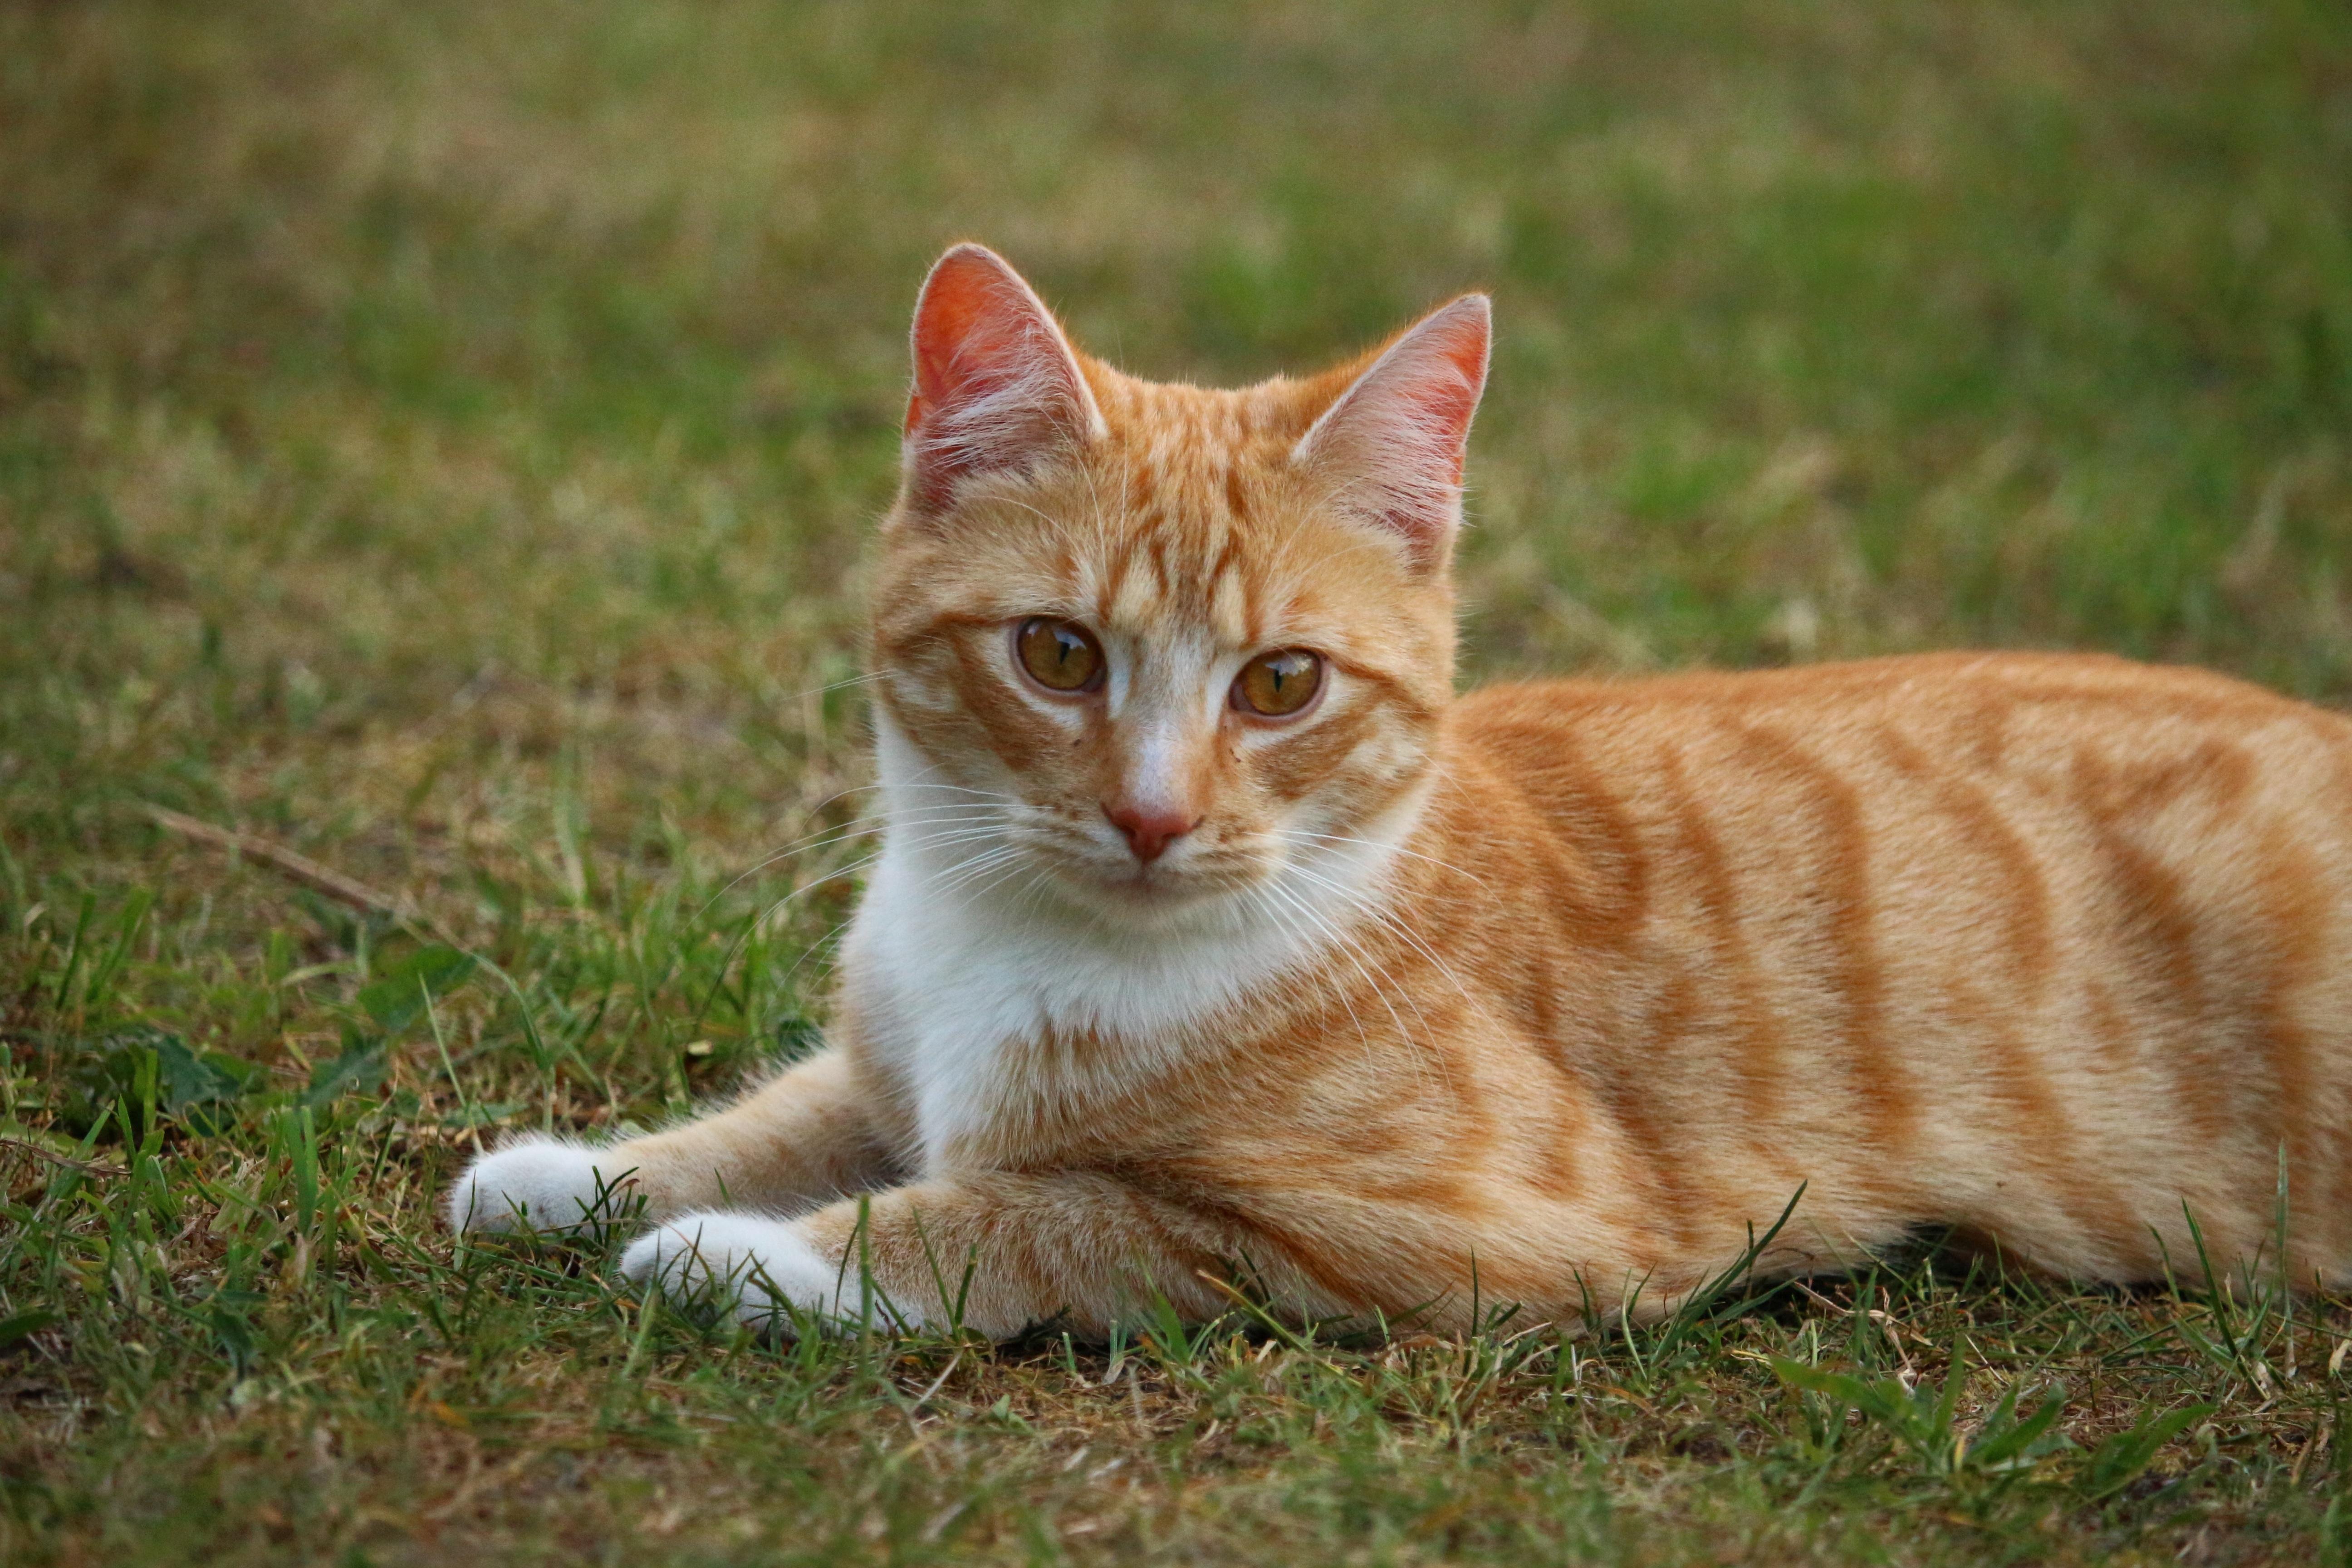 https://get.pxhere.com/photo/grass-kitten-cat-mammal-fauna-whiskers-vertebrate-mieze-domestic-cat-mackerel-tiger-cat-red-cat-tabby-cat-bengal-european-shorthair-wild-cat-small-to-medium-sized-cats-cat-like-mammal-domestic-short-haired-cat-pixie-bob-rusty-spotted-cat-ocicat-toyger-619787.jpg